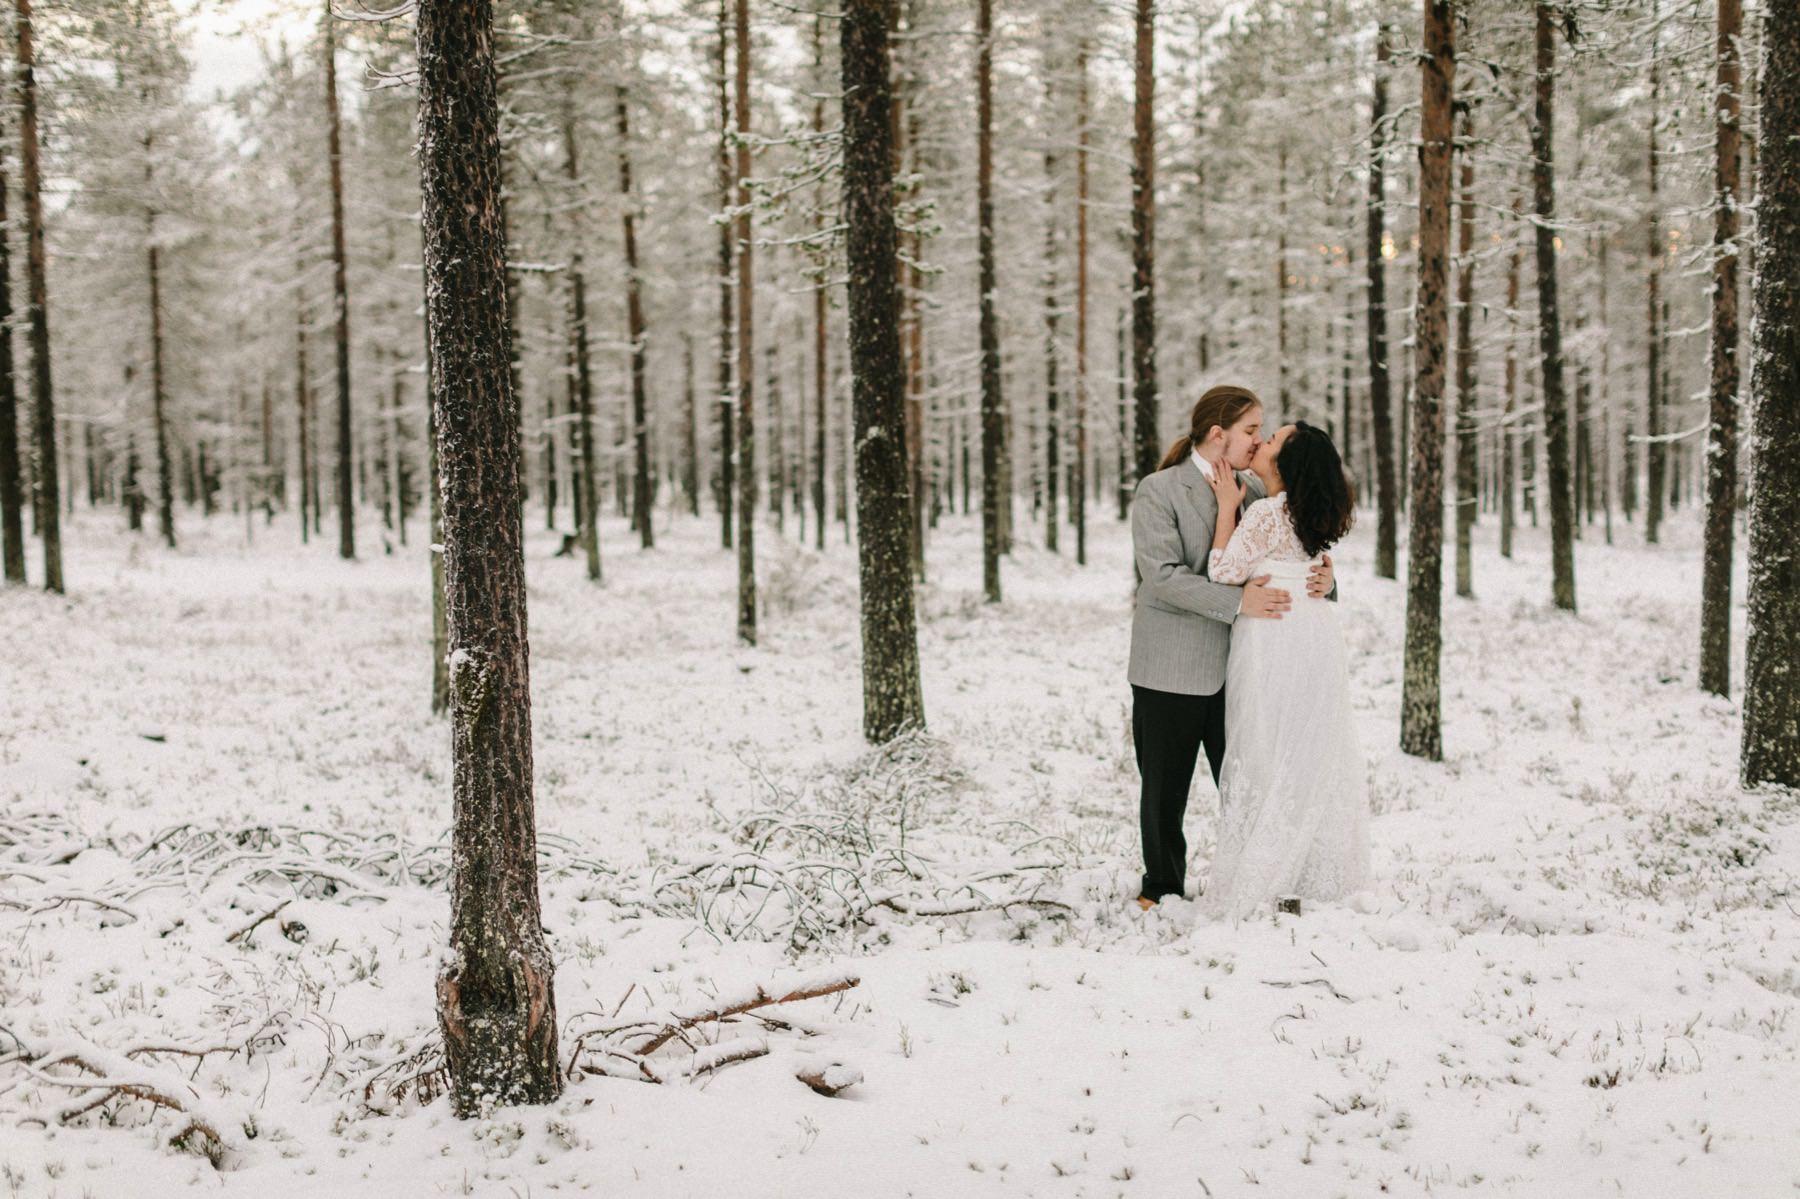 photographer in Lapland